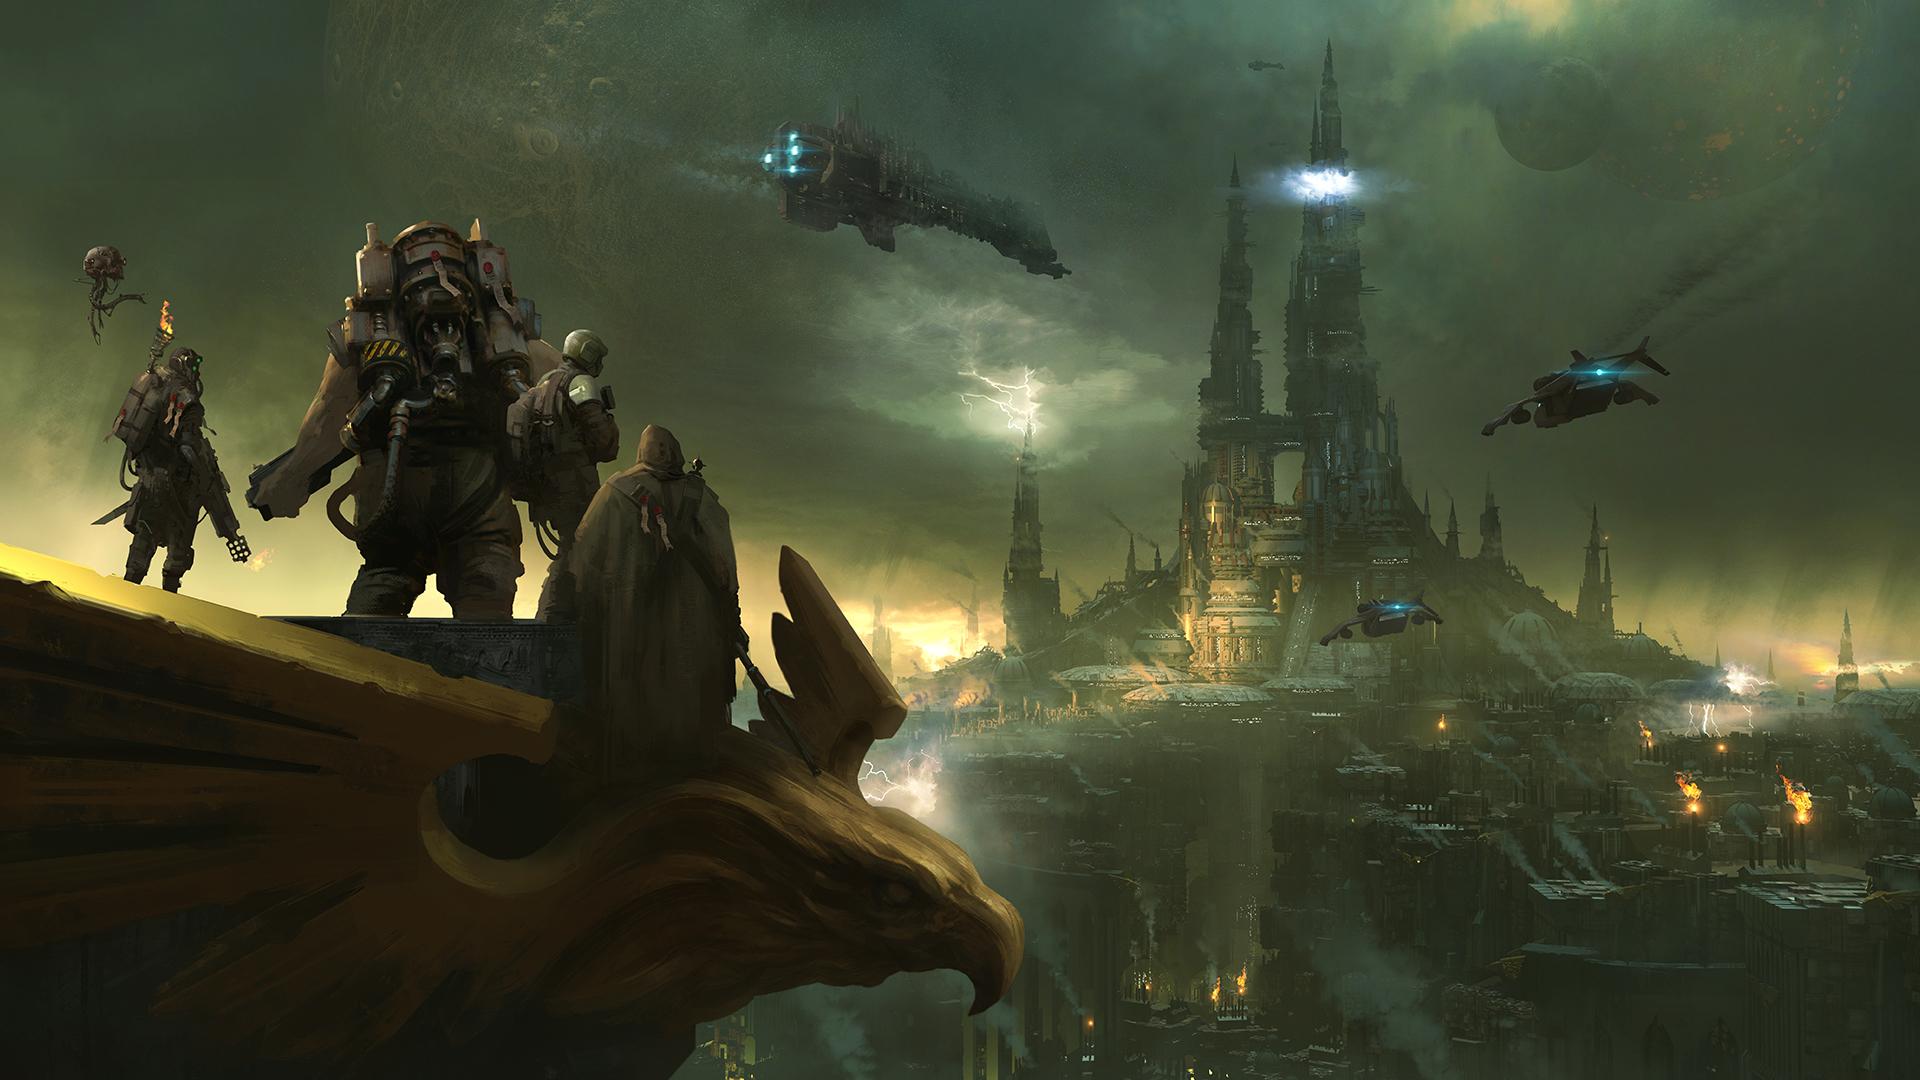 Warhammer 40k Darktide Wallpaper Hd Games 4k Wallpapers Images Photos And Background